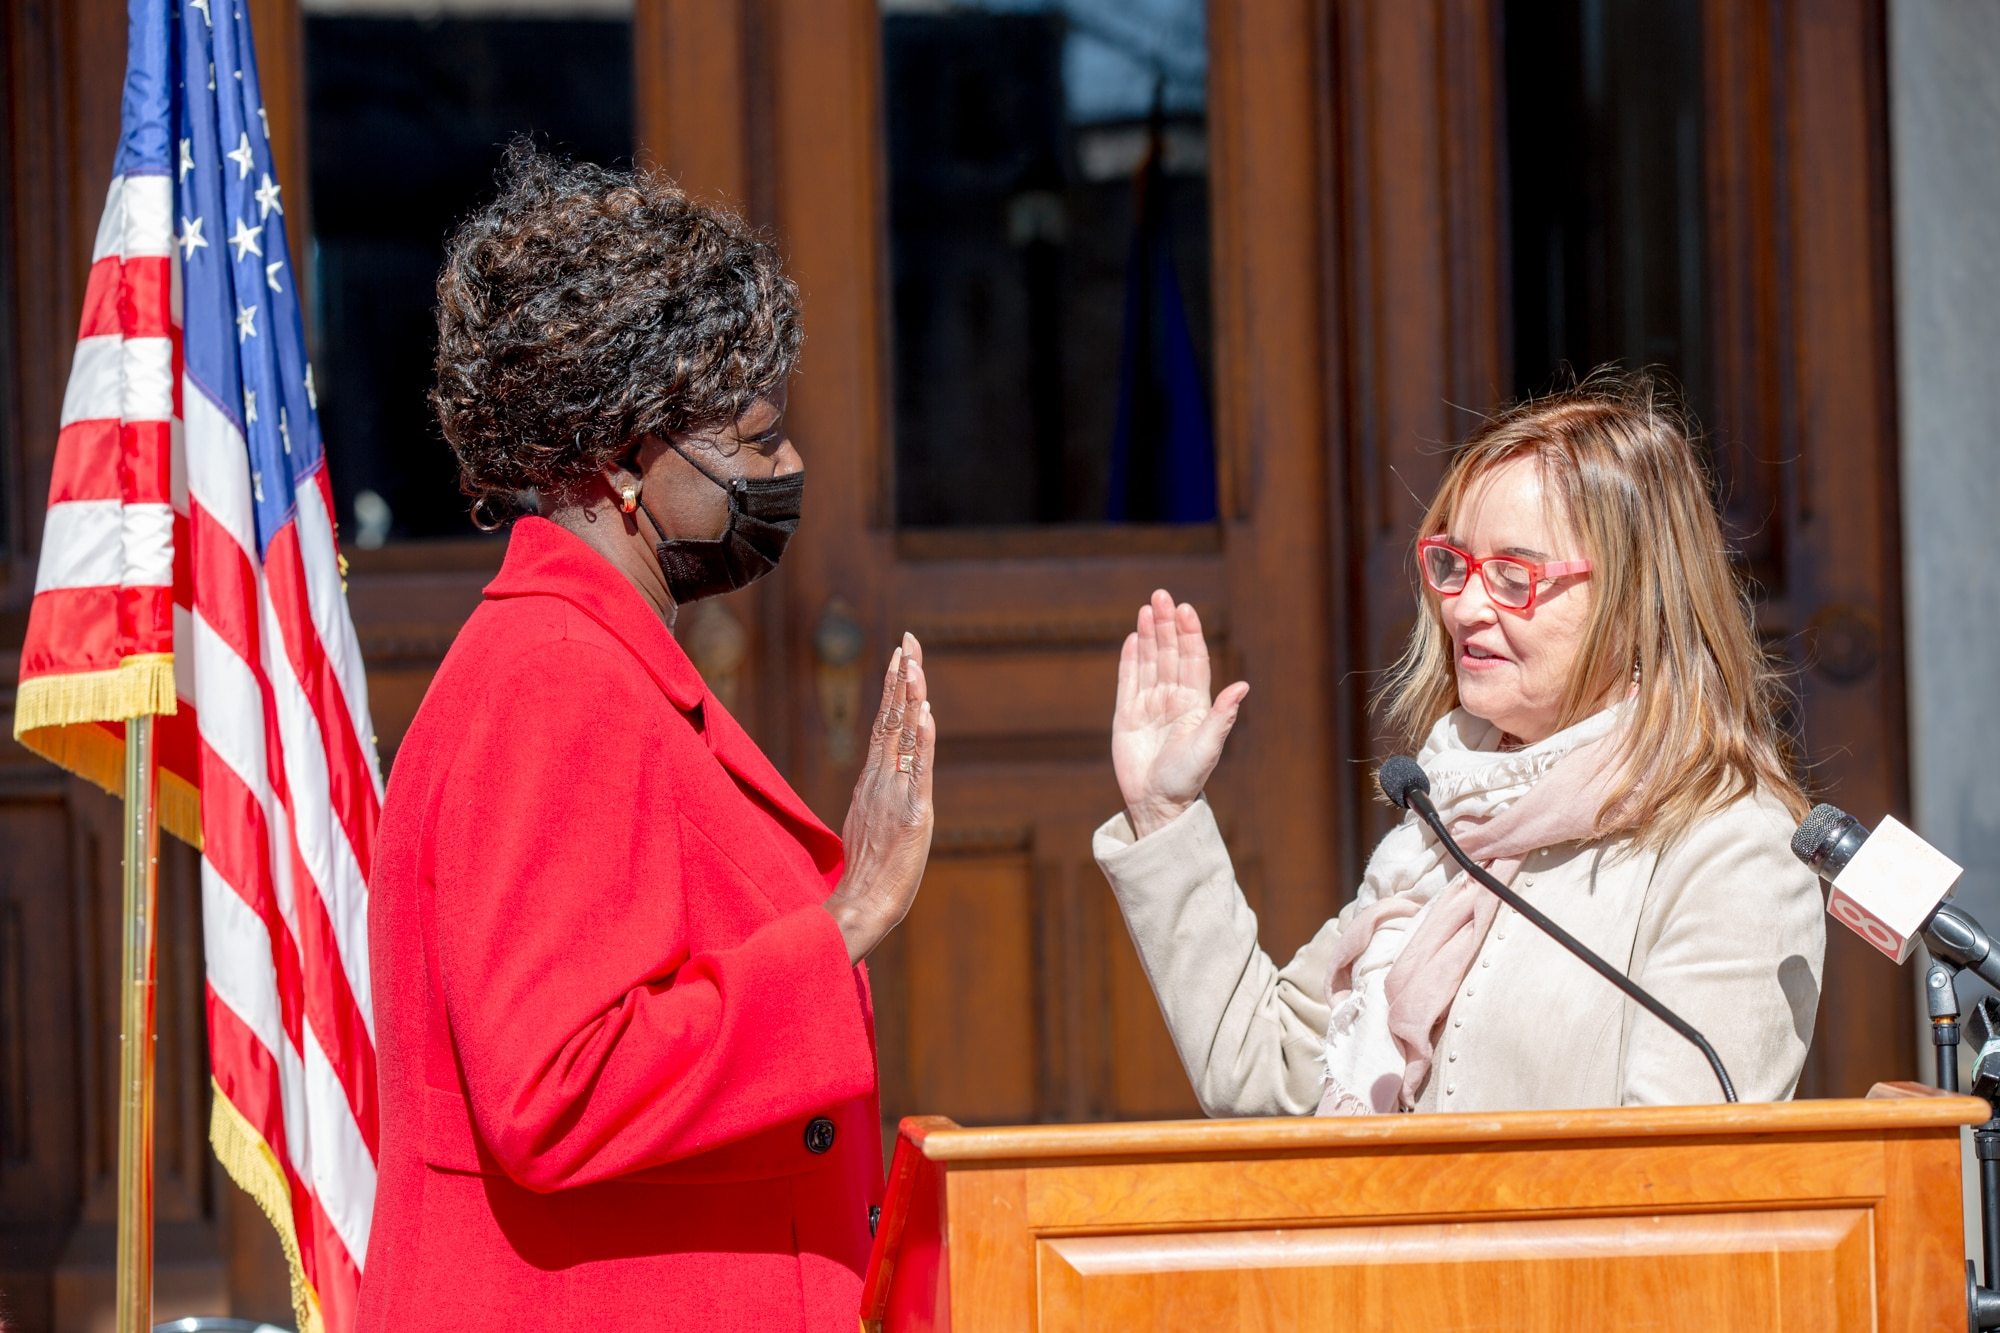 Patricia Billie Miller breaks ground taking Senate seat